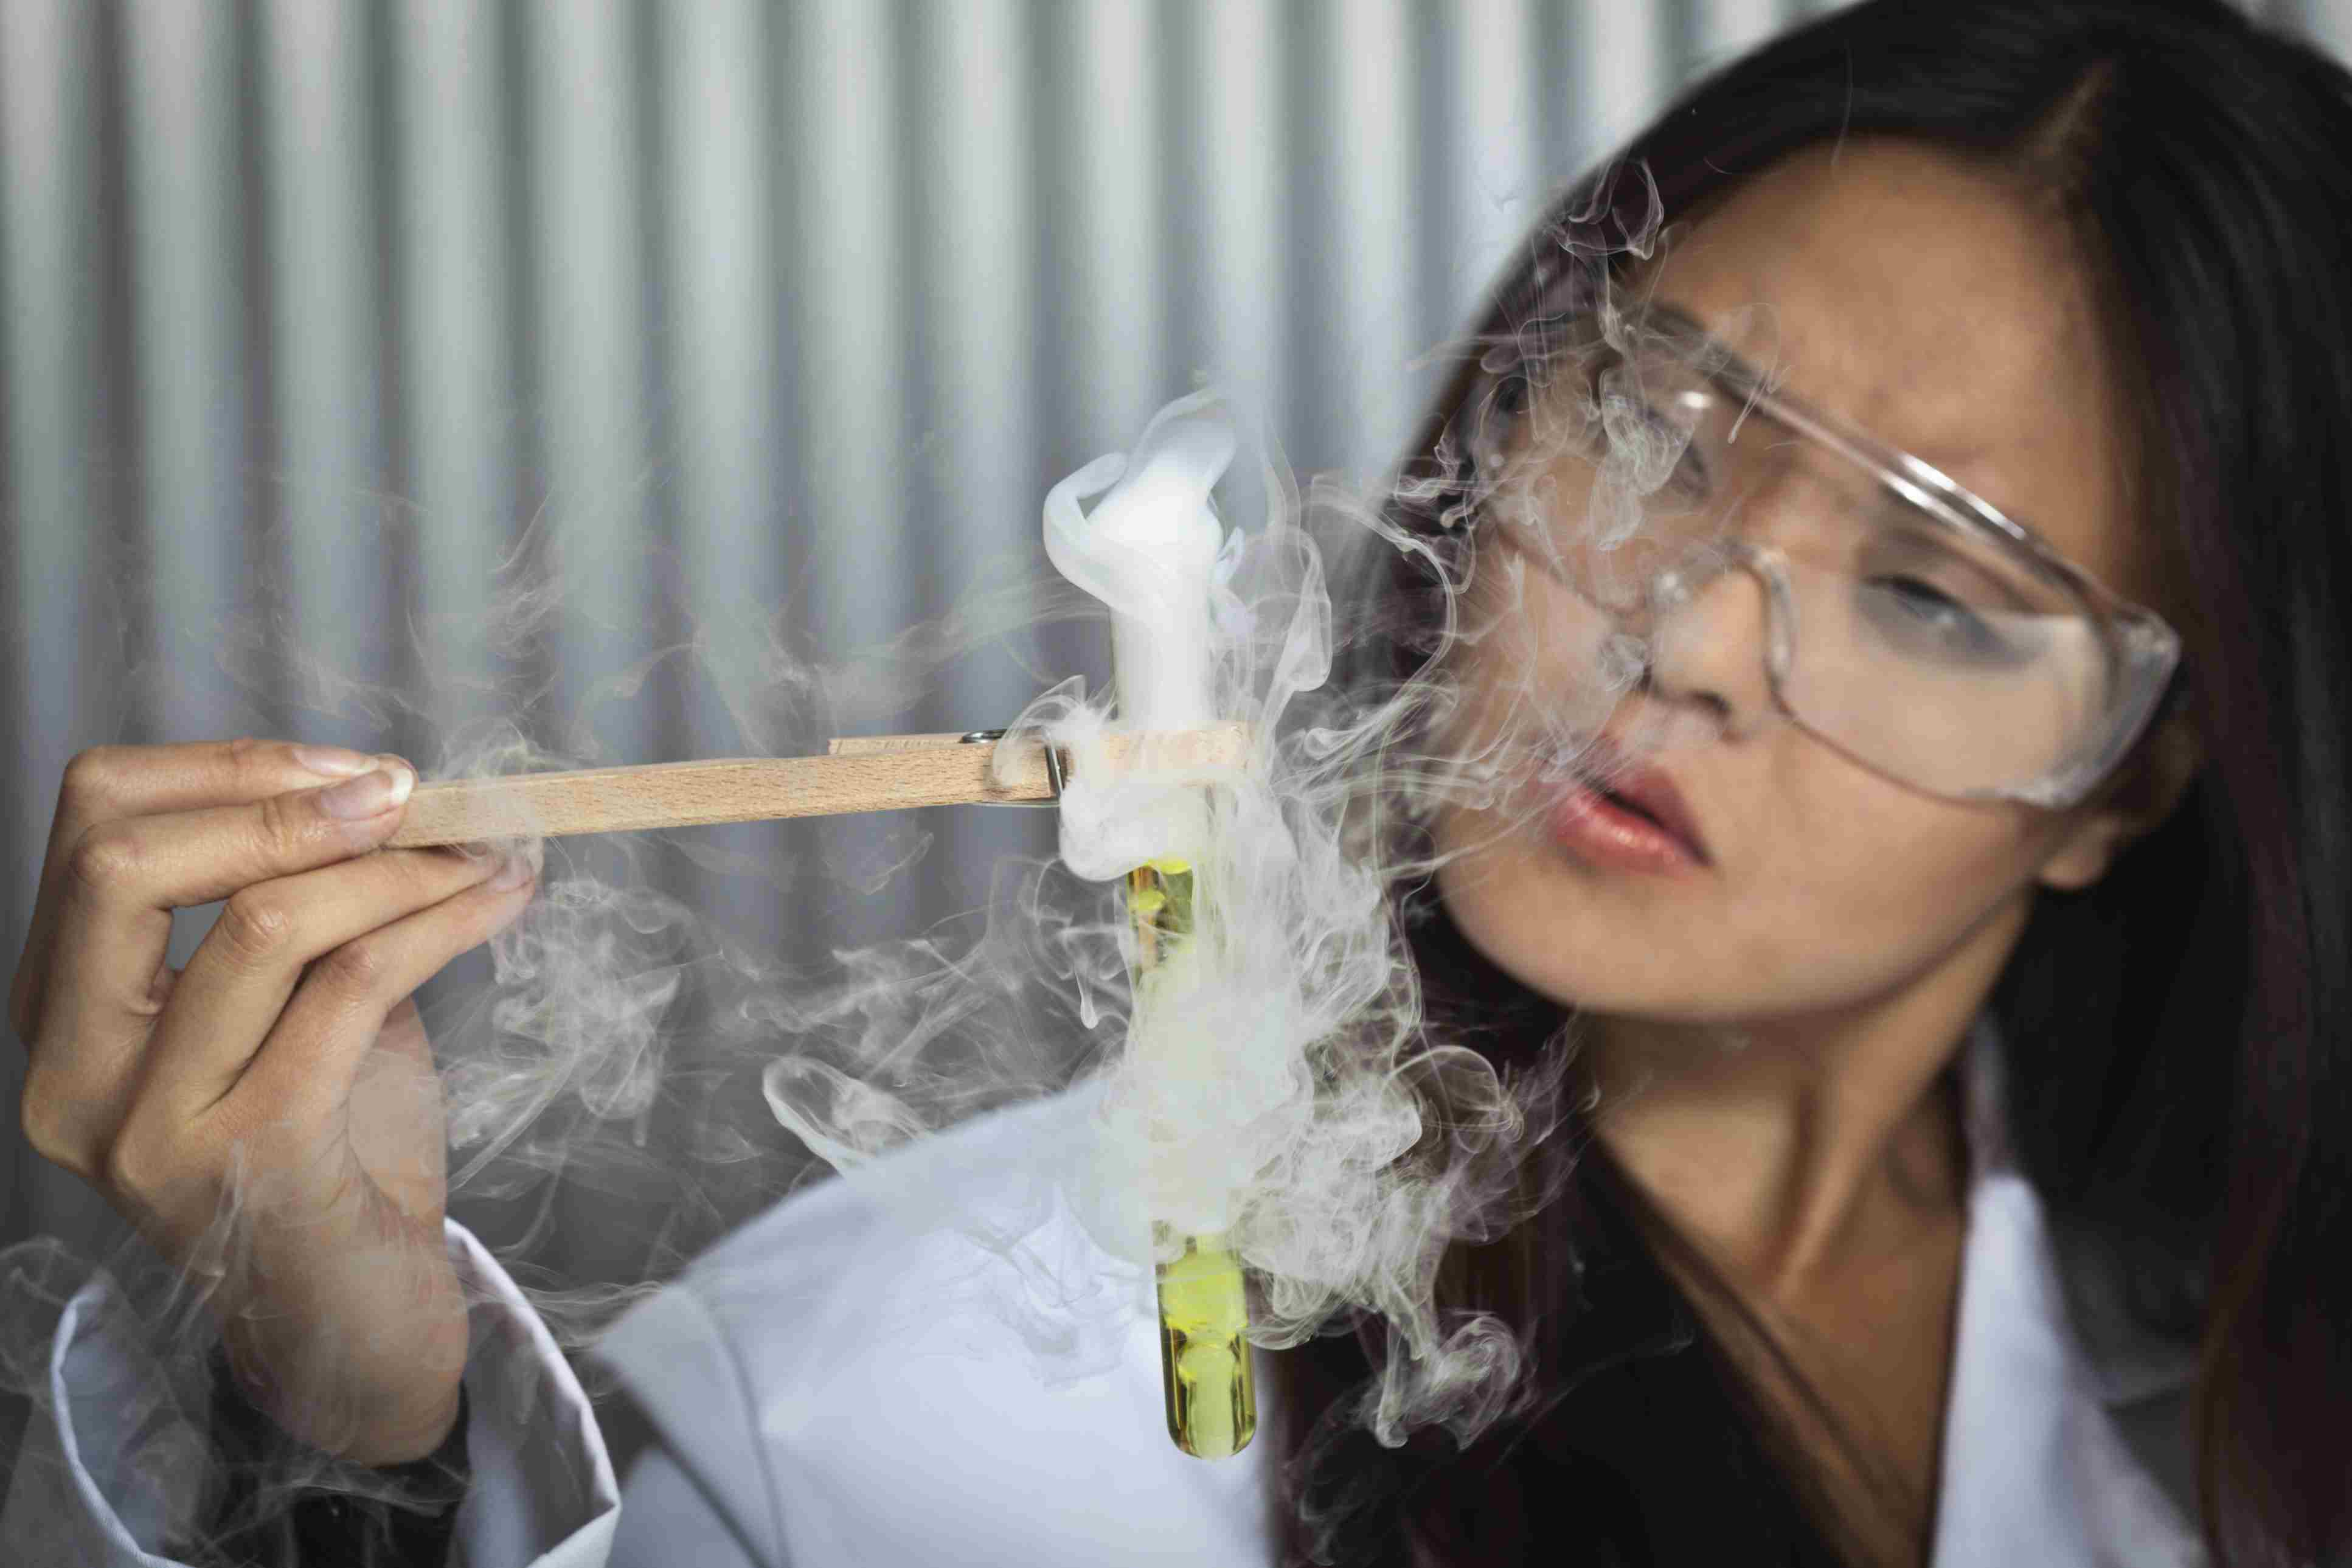 9 Worst Lab Smells - Stinky Laboratory Chemicals